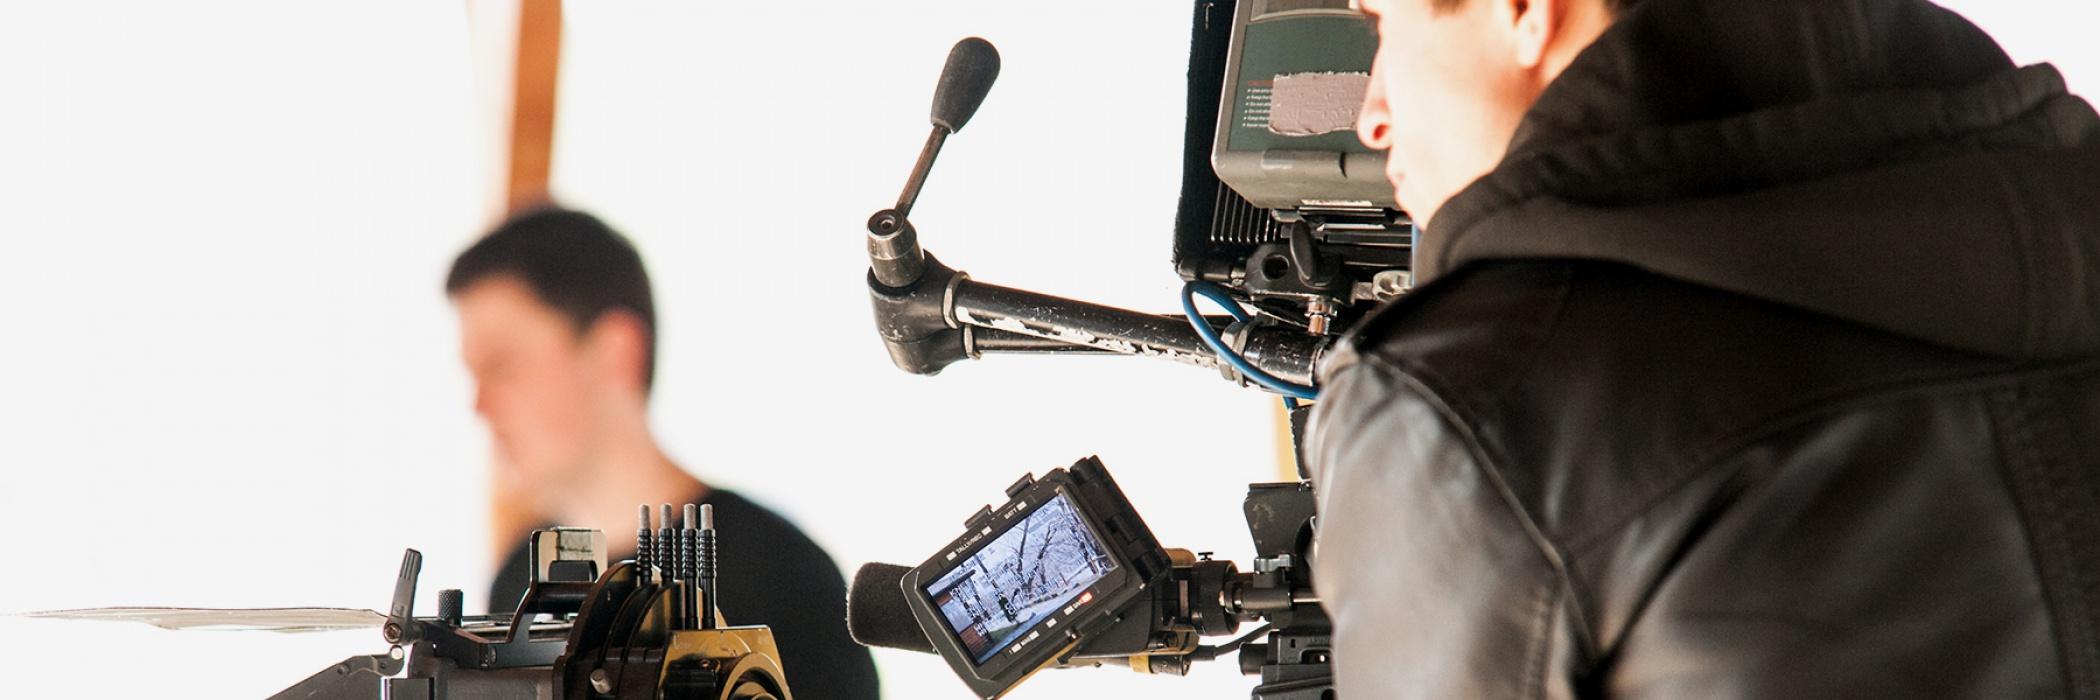 shooting video